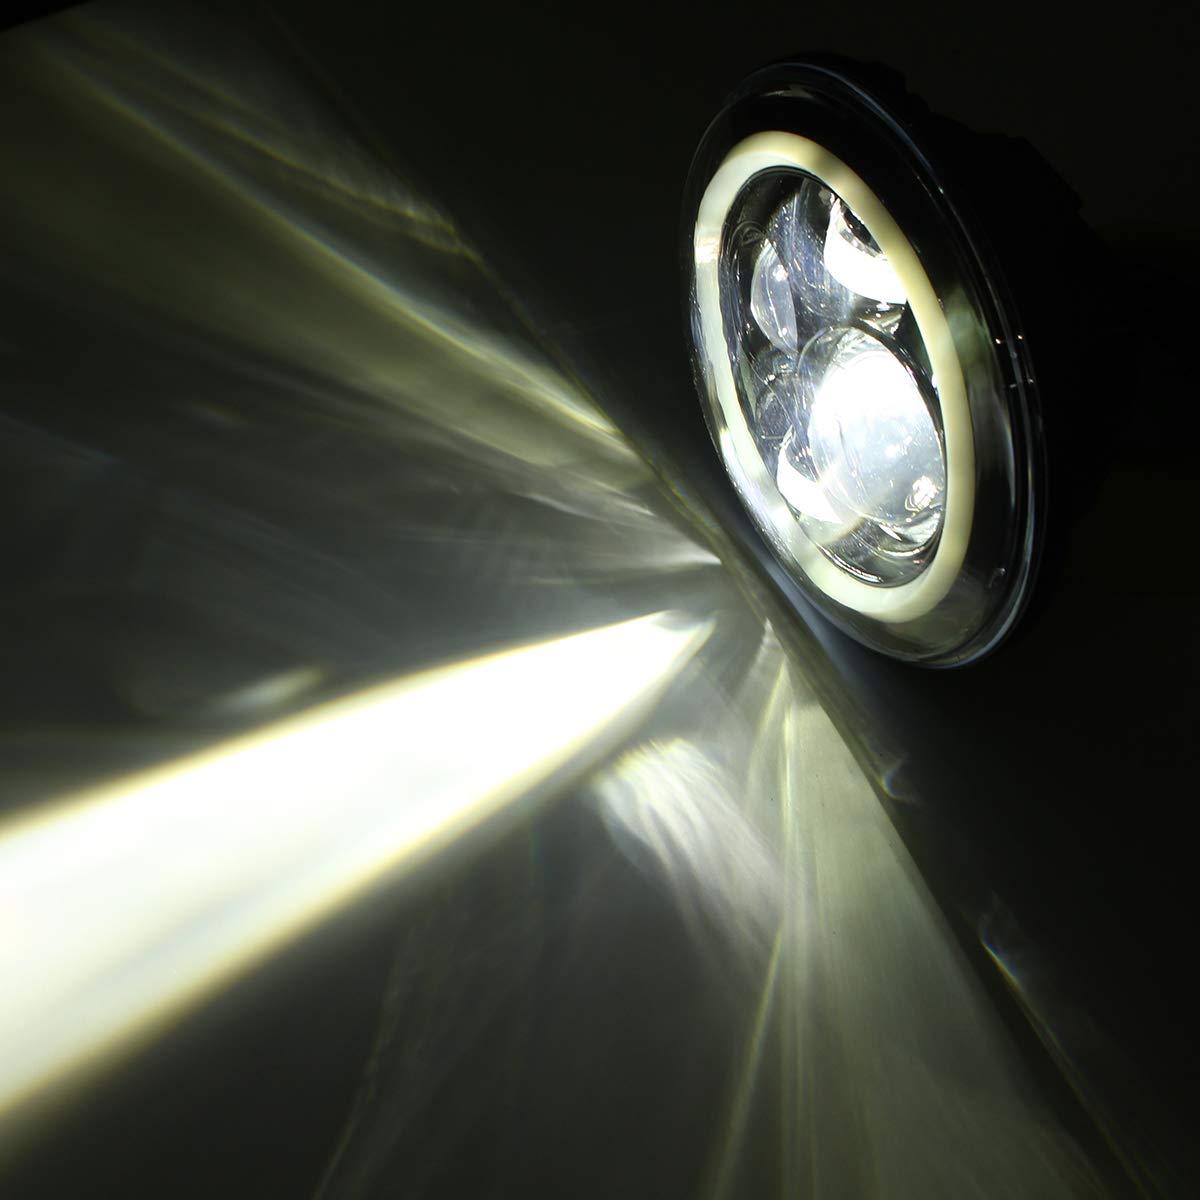 12-30V 7 Inch Round LED Front Headlights Halo Angle Eyes Light for Wrangler JK TJ 97-15 by Topker (Image #7)